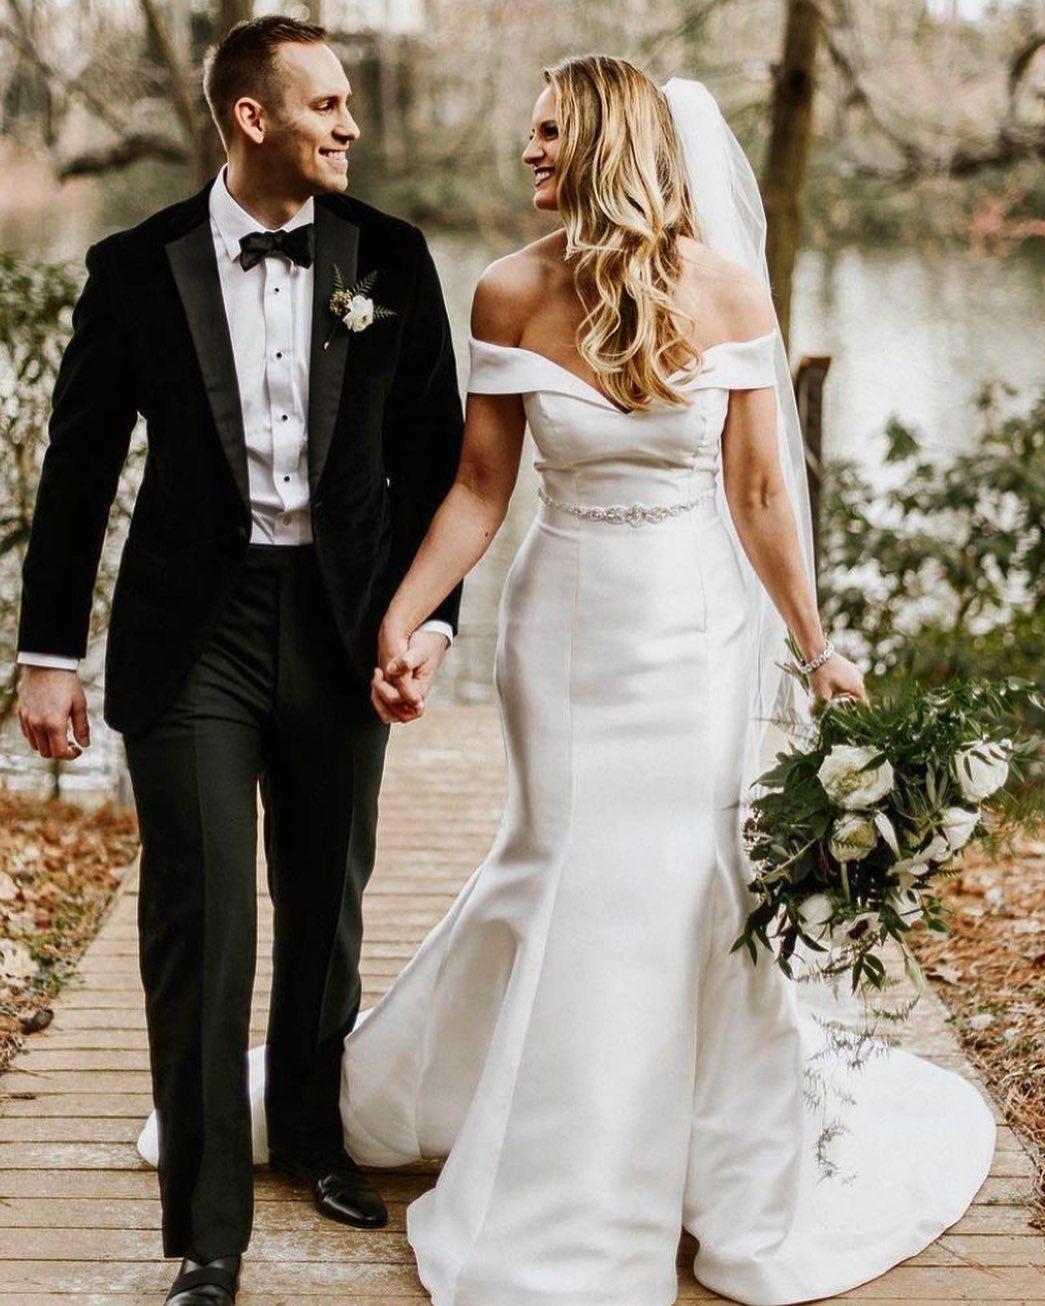 Josie By Rebecca Ingram Wedding Dresses And Accessories Wedding Dresses Simple Wedding Gowns Classic Wedding Dress [ 1306 x 1045 Pixel ]